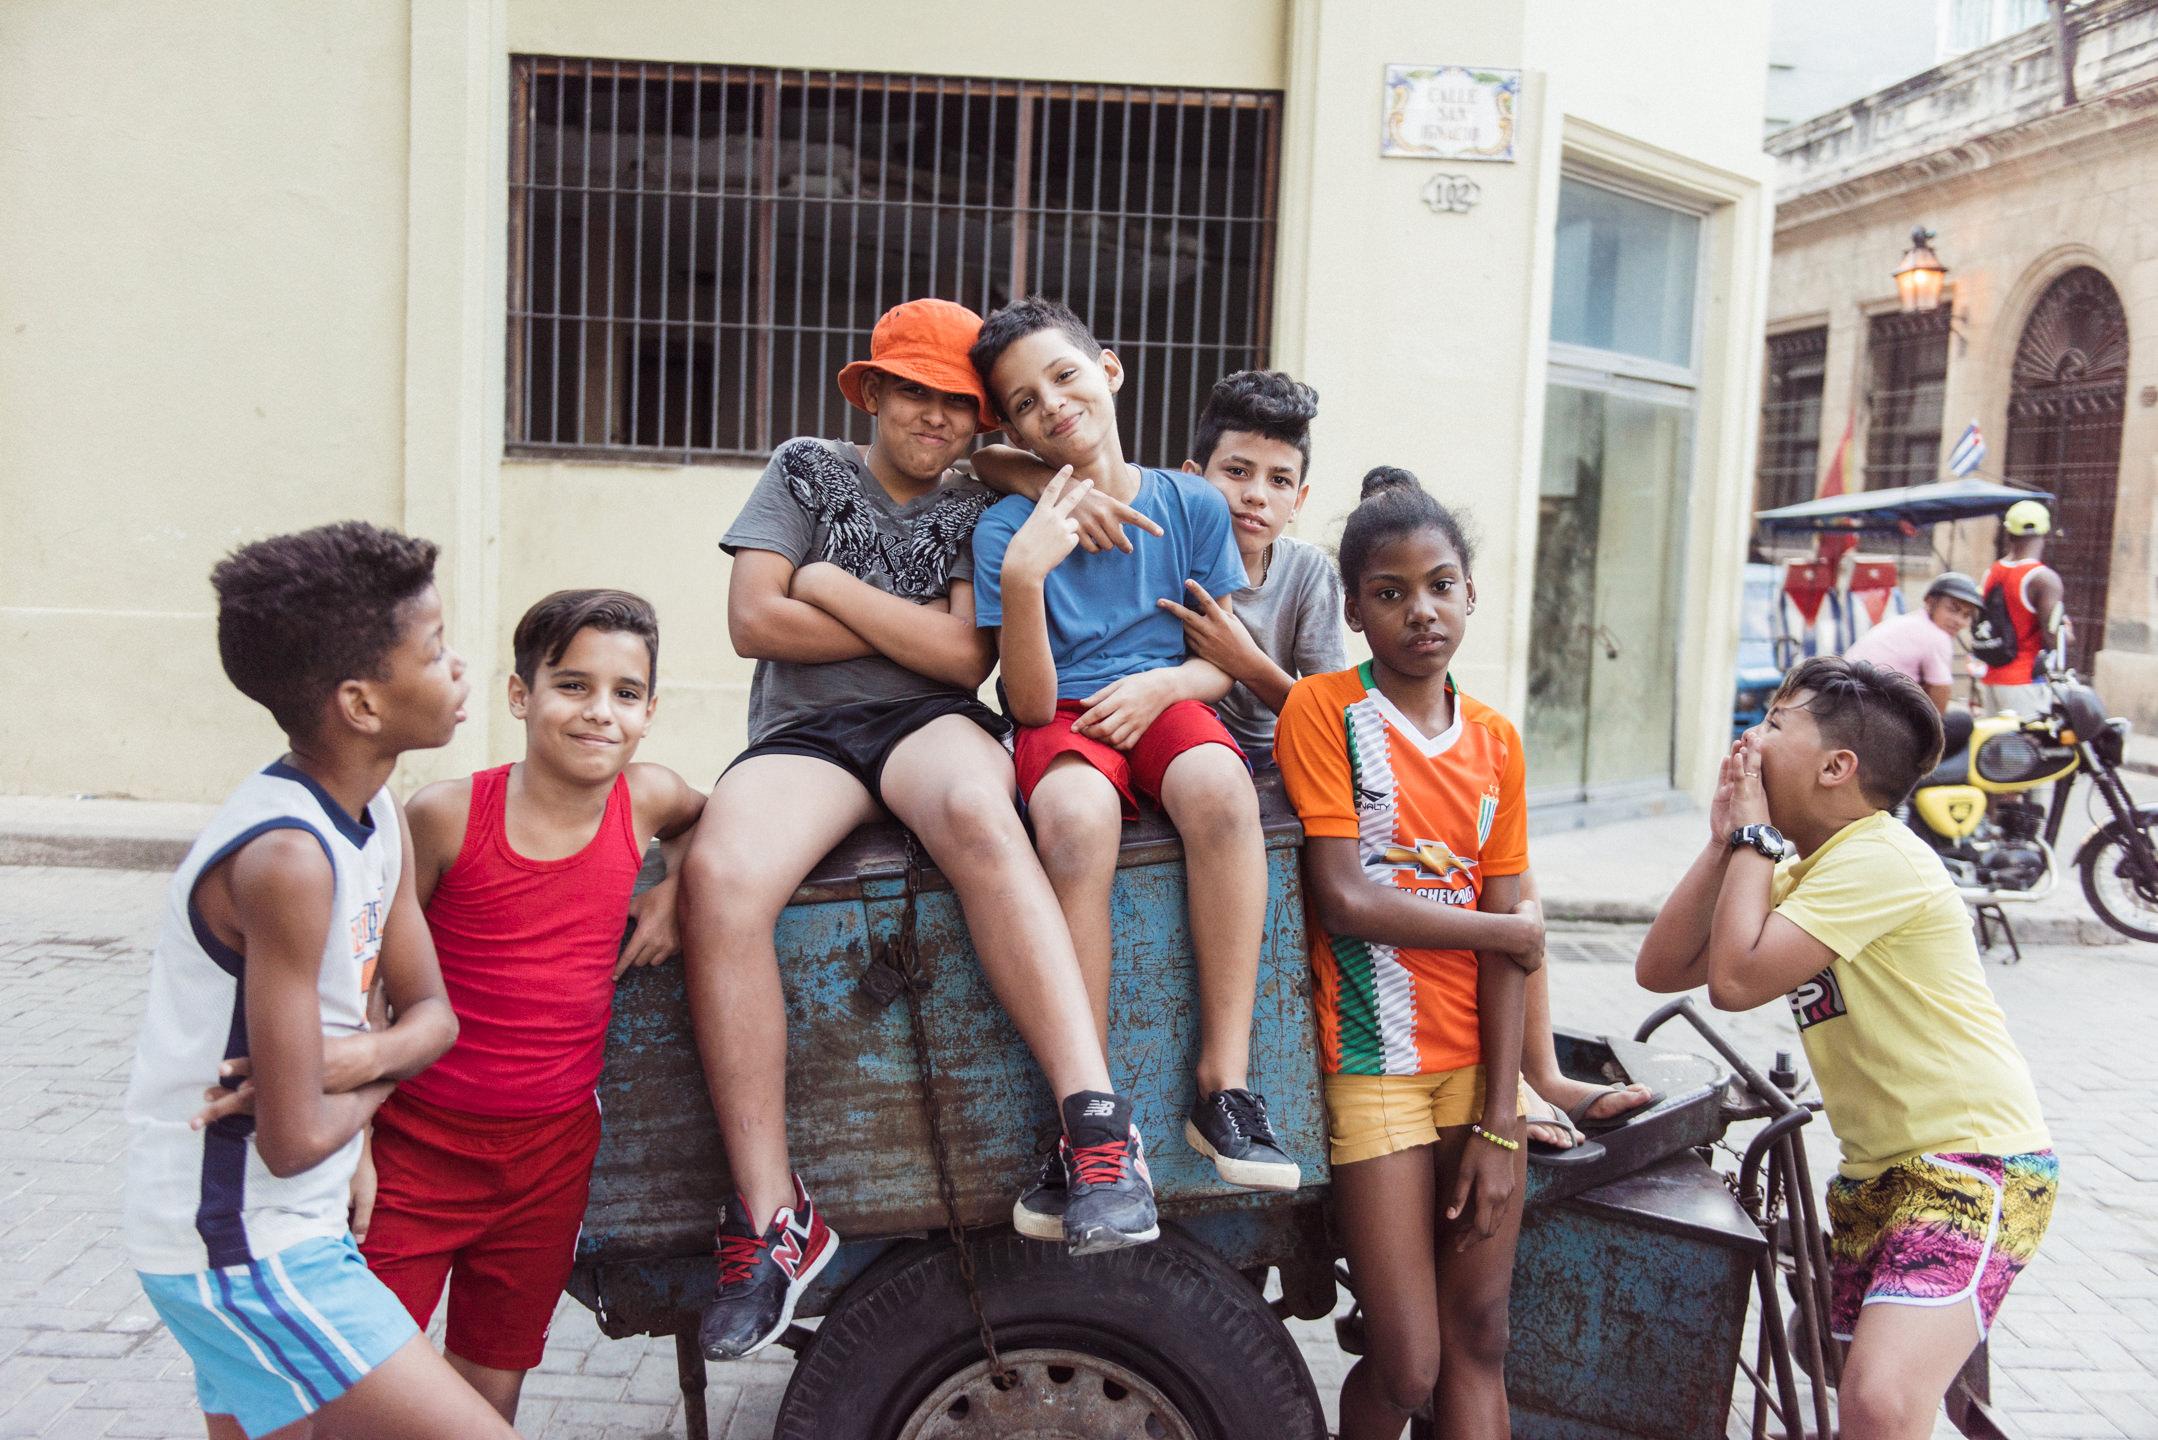 Elliott O'Donovan Photography - Havana Cuba  (3 of 12).jpg